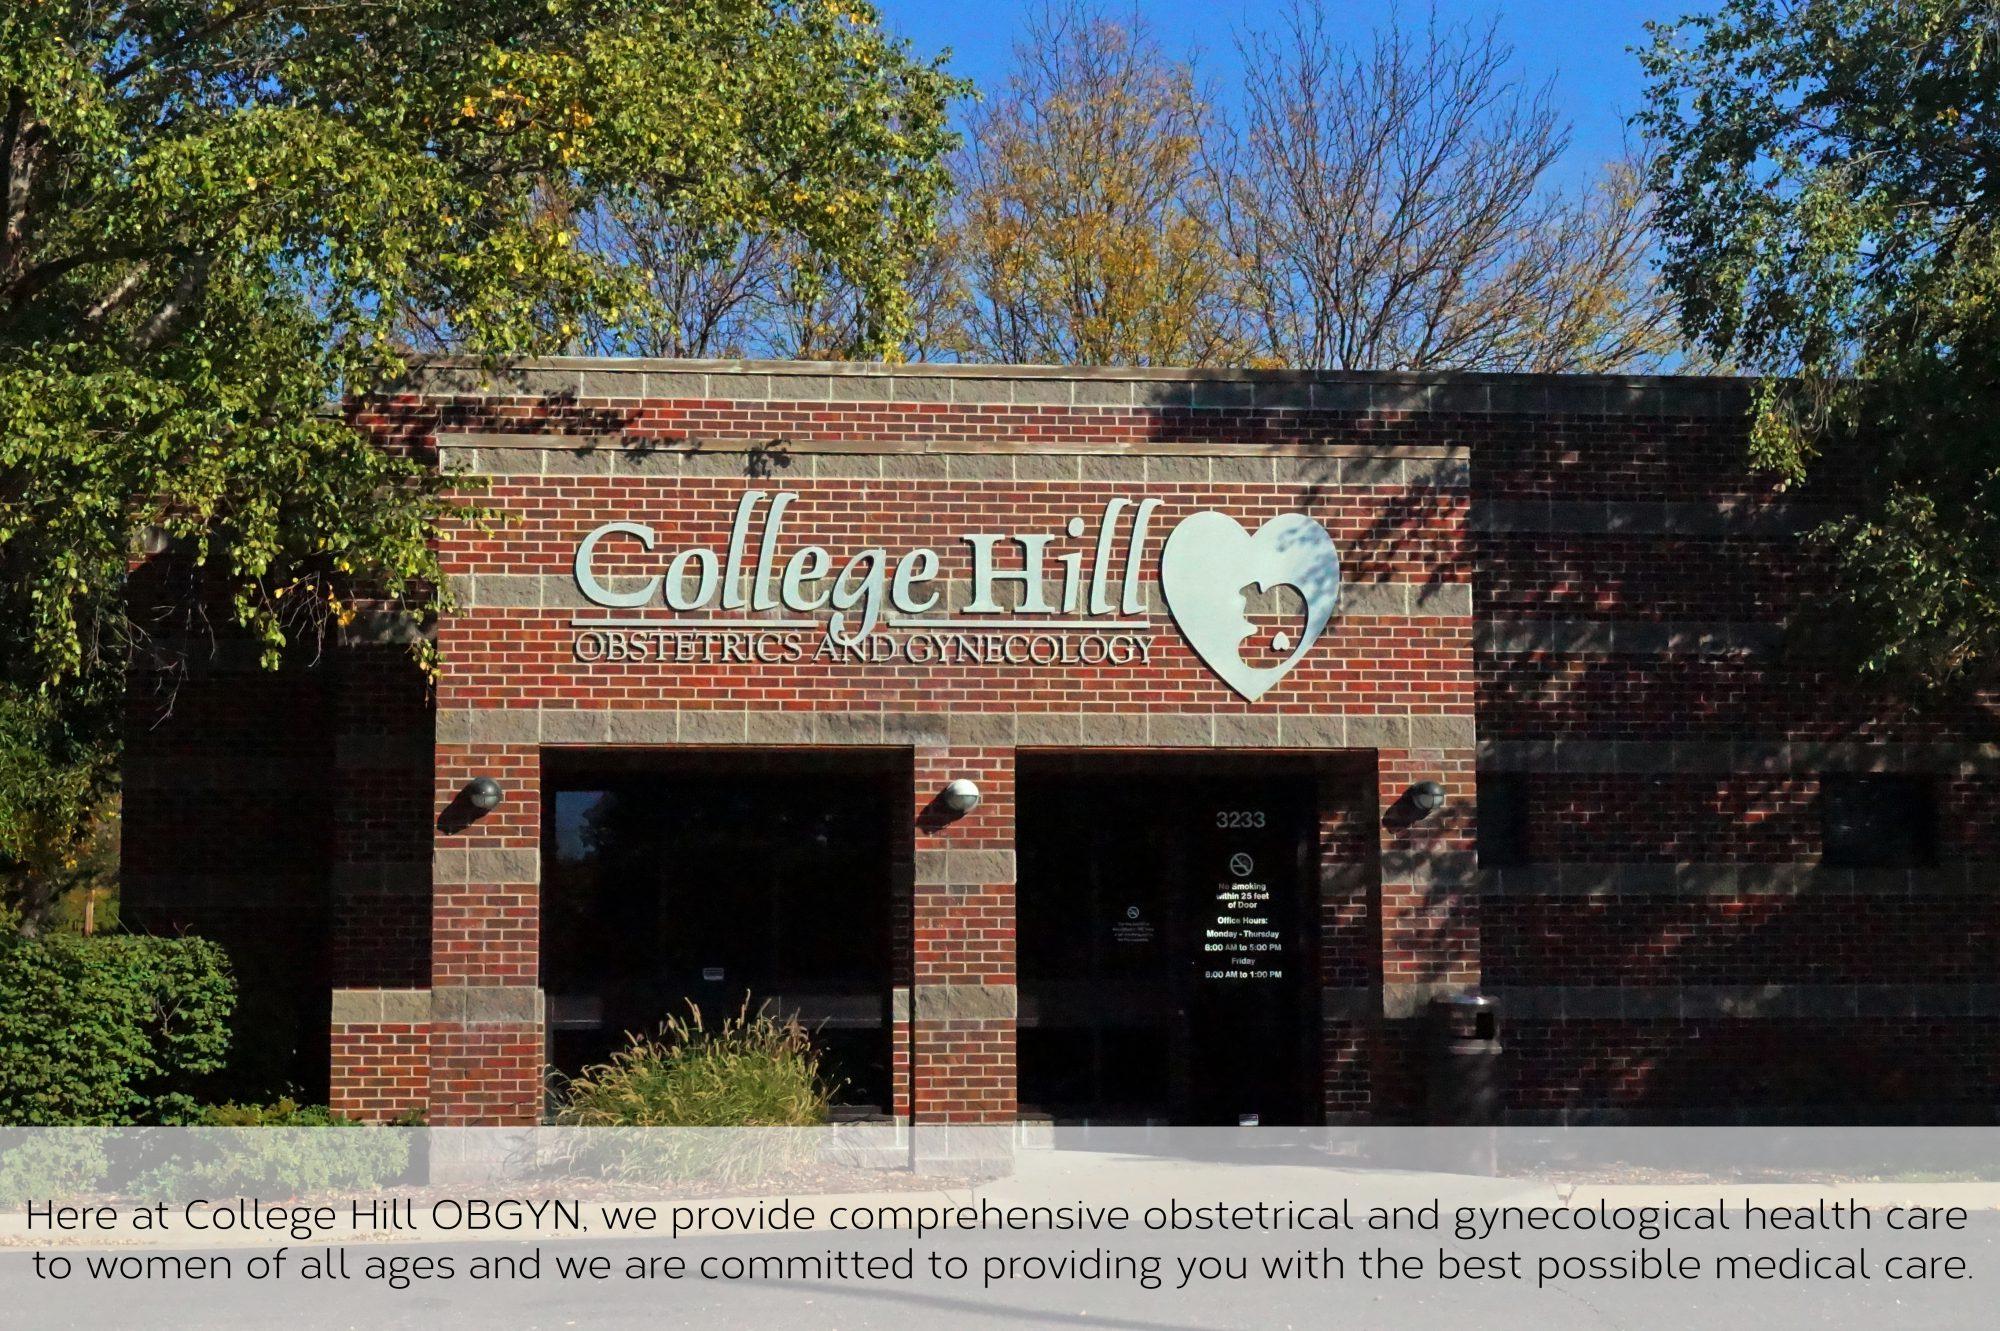 College Hill Obgyn